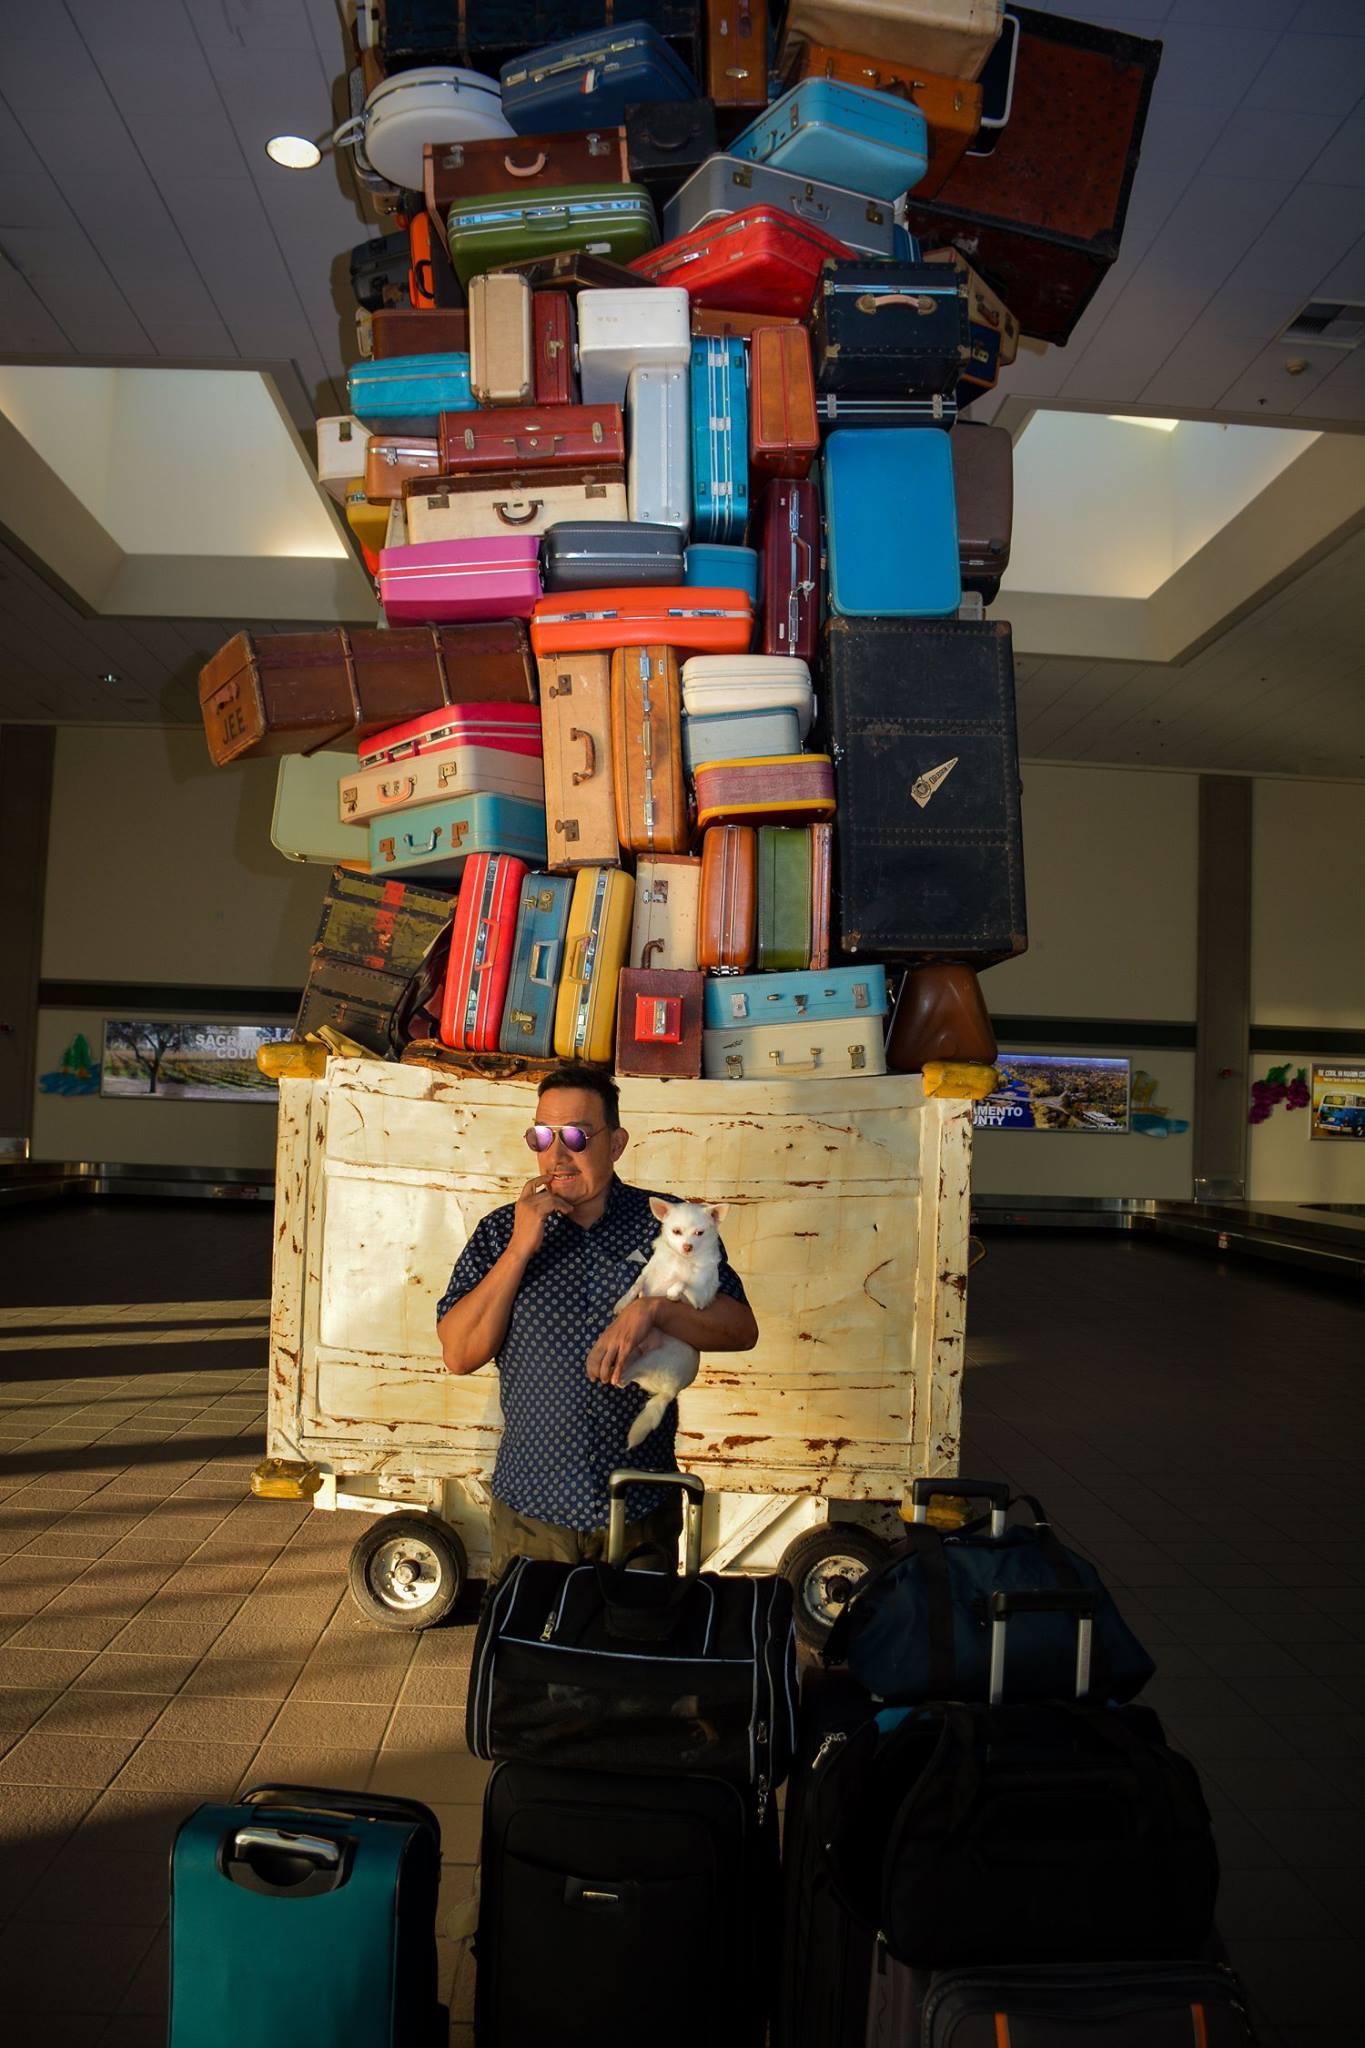 Anthony Rubio arrives in Sacramento